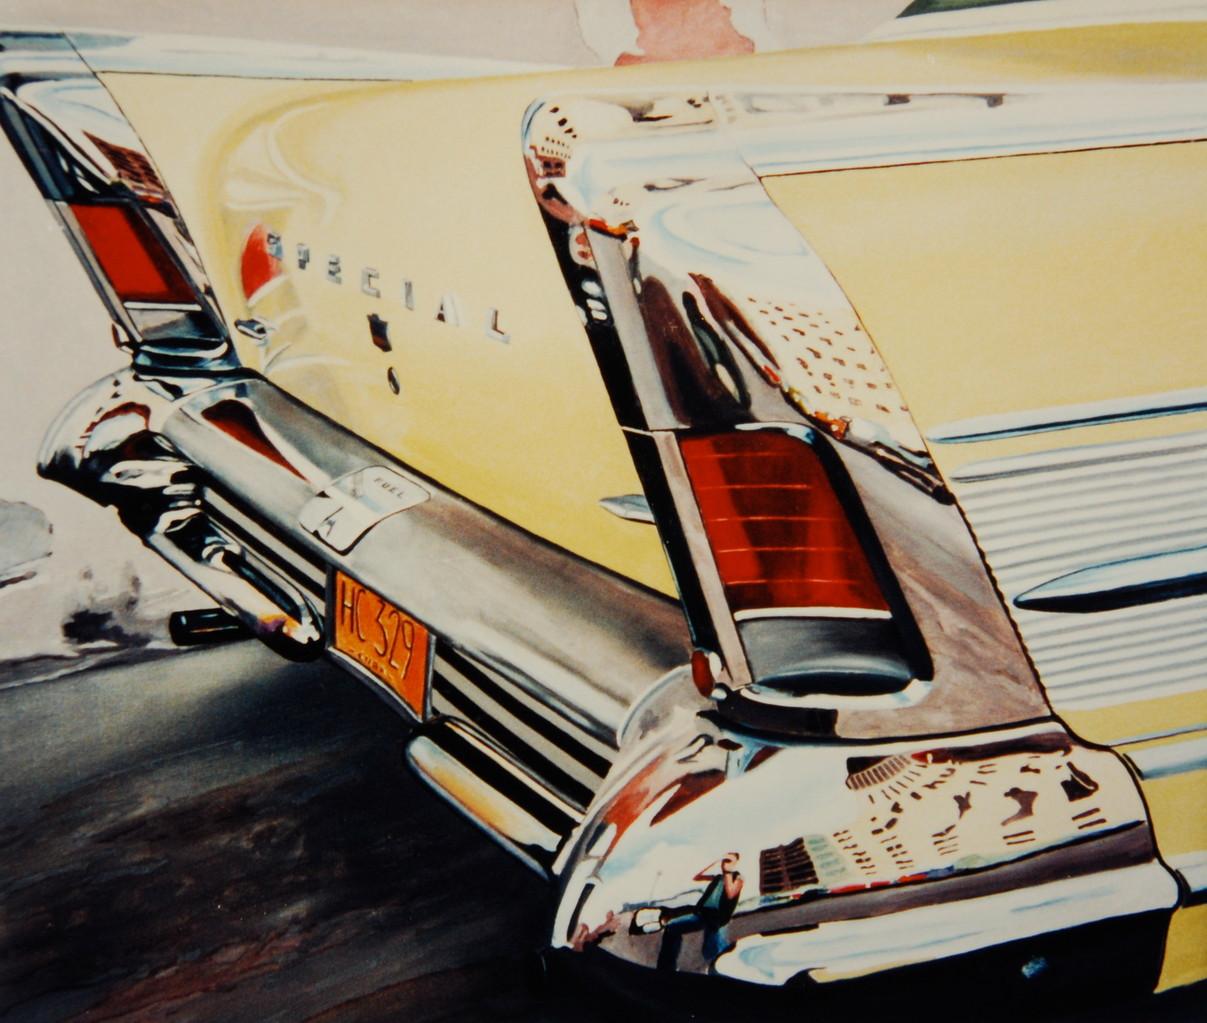 Special, 1986, 135 x 105 cm, Privatsammlung Dr. Doldinger